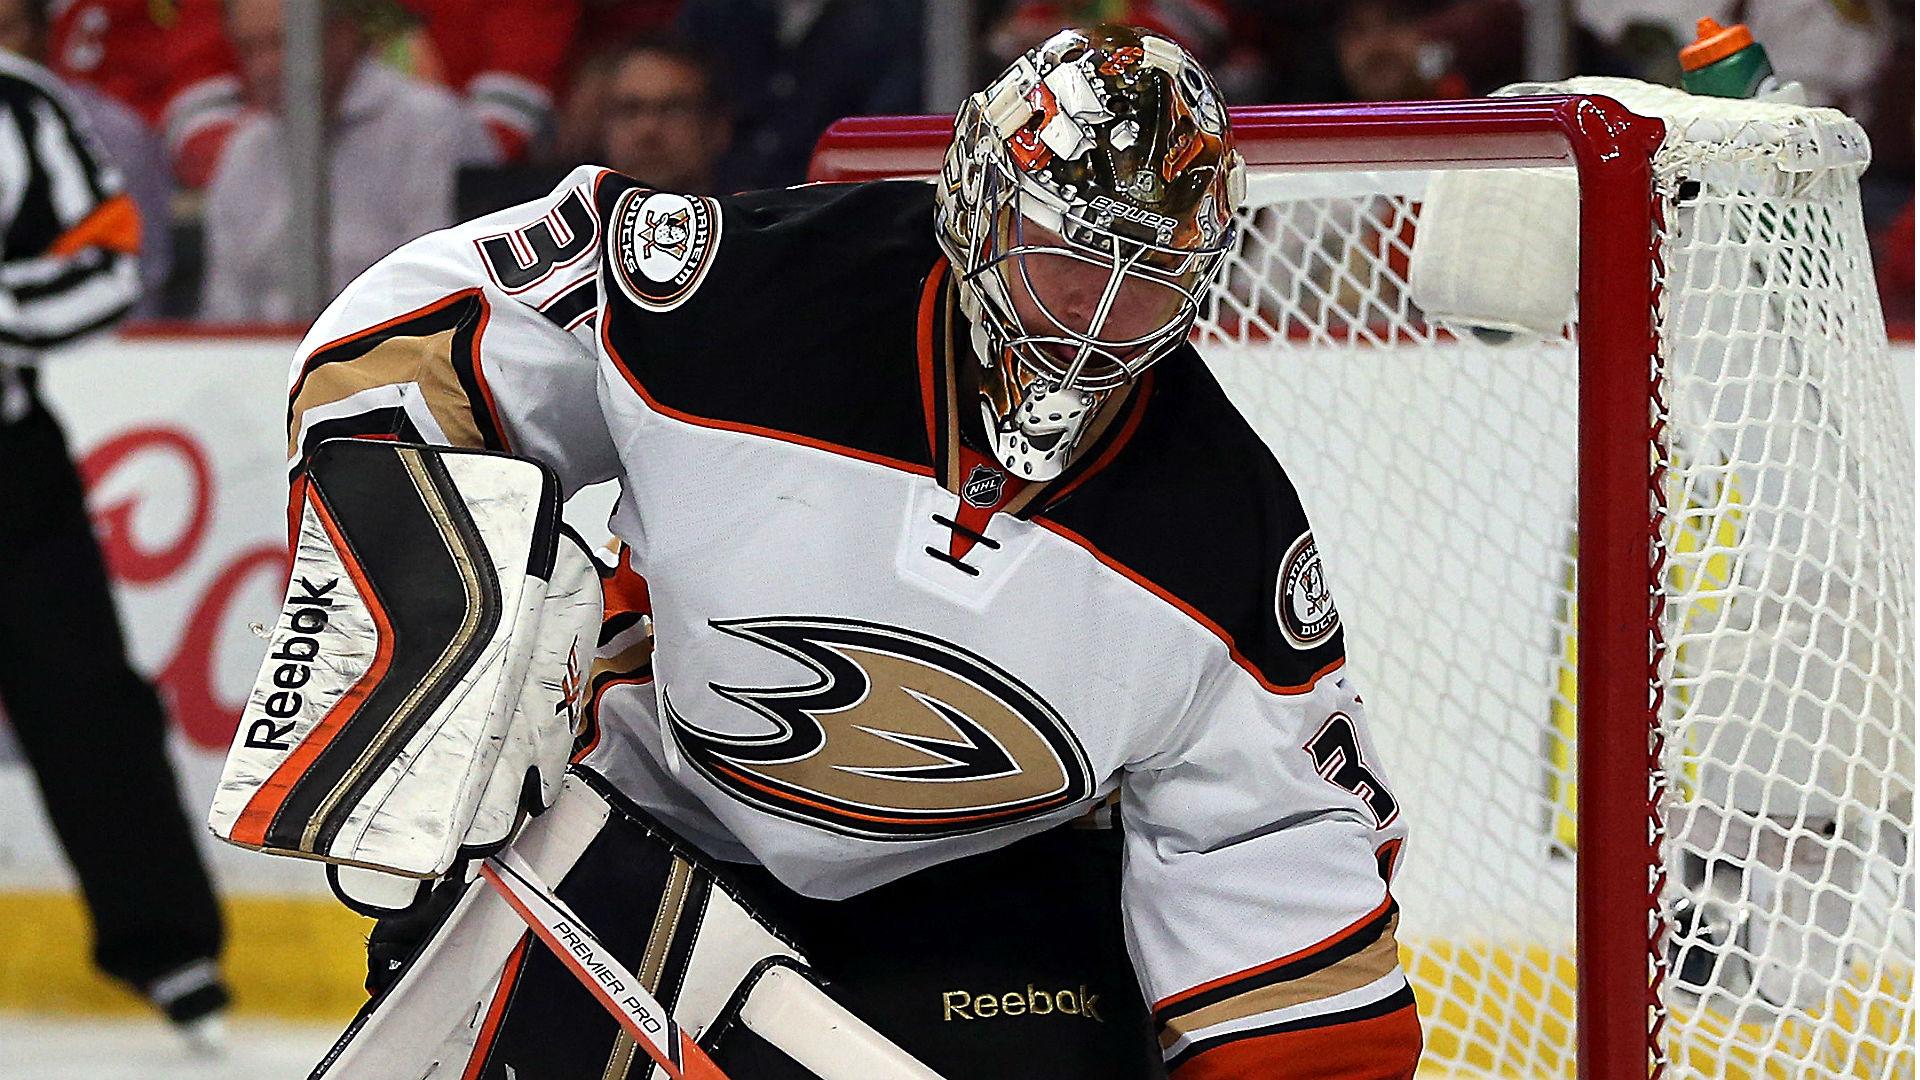 Blackhawks vs. Ducks Game 5 odds and betting analysis — Anaheim emerges as series favorite